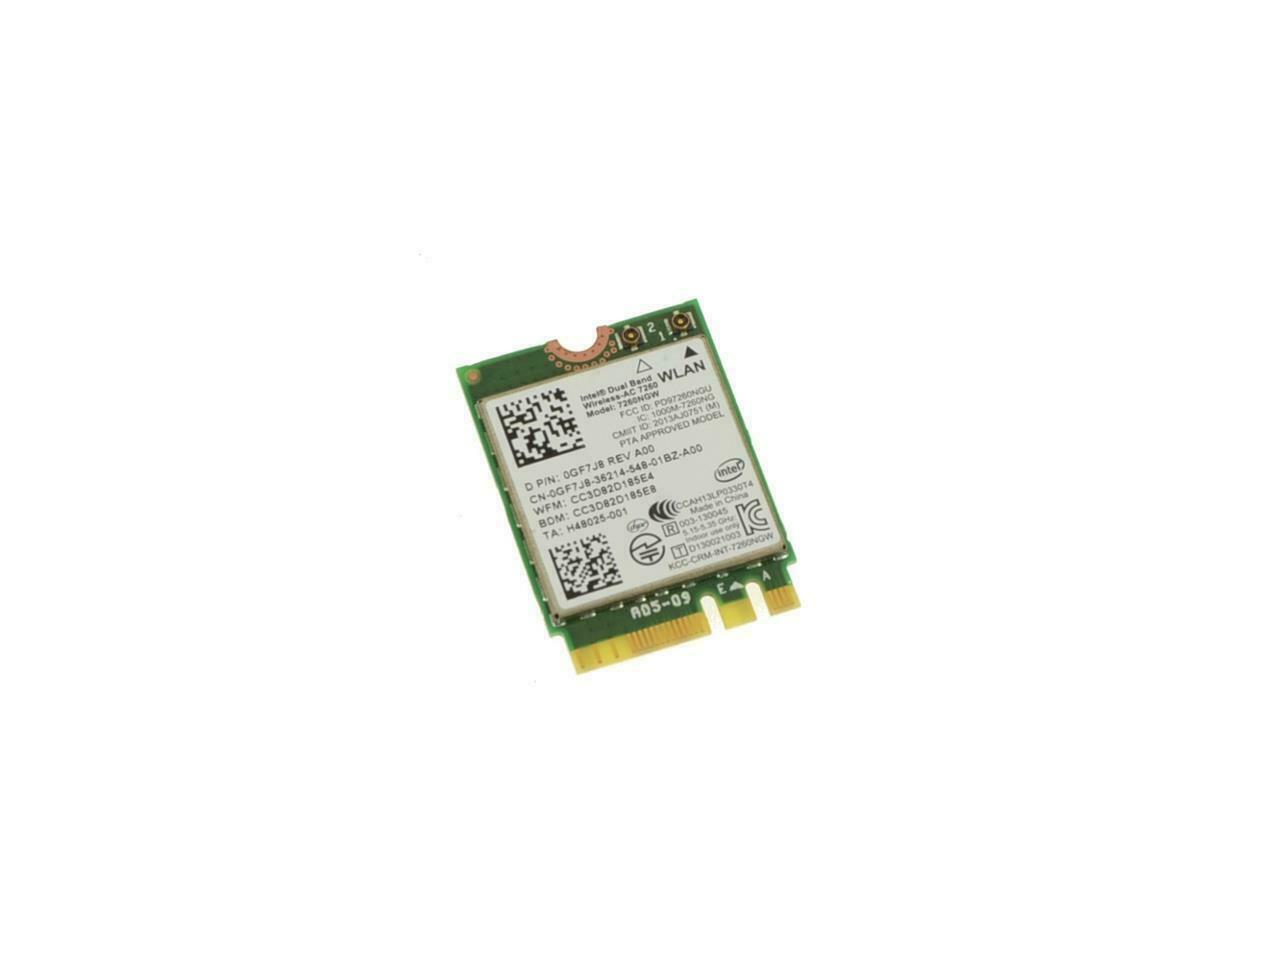 Intel Venue 11 Pro Wireless-AC7260 Wifi Bluetooth 4.0 LTP Card Dell GF7J8 TESTED